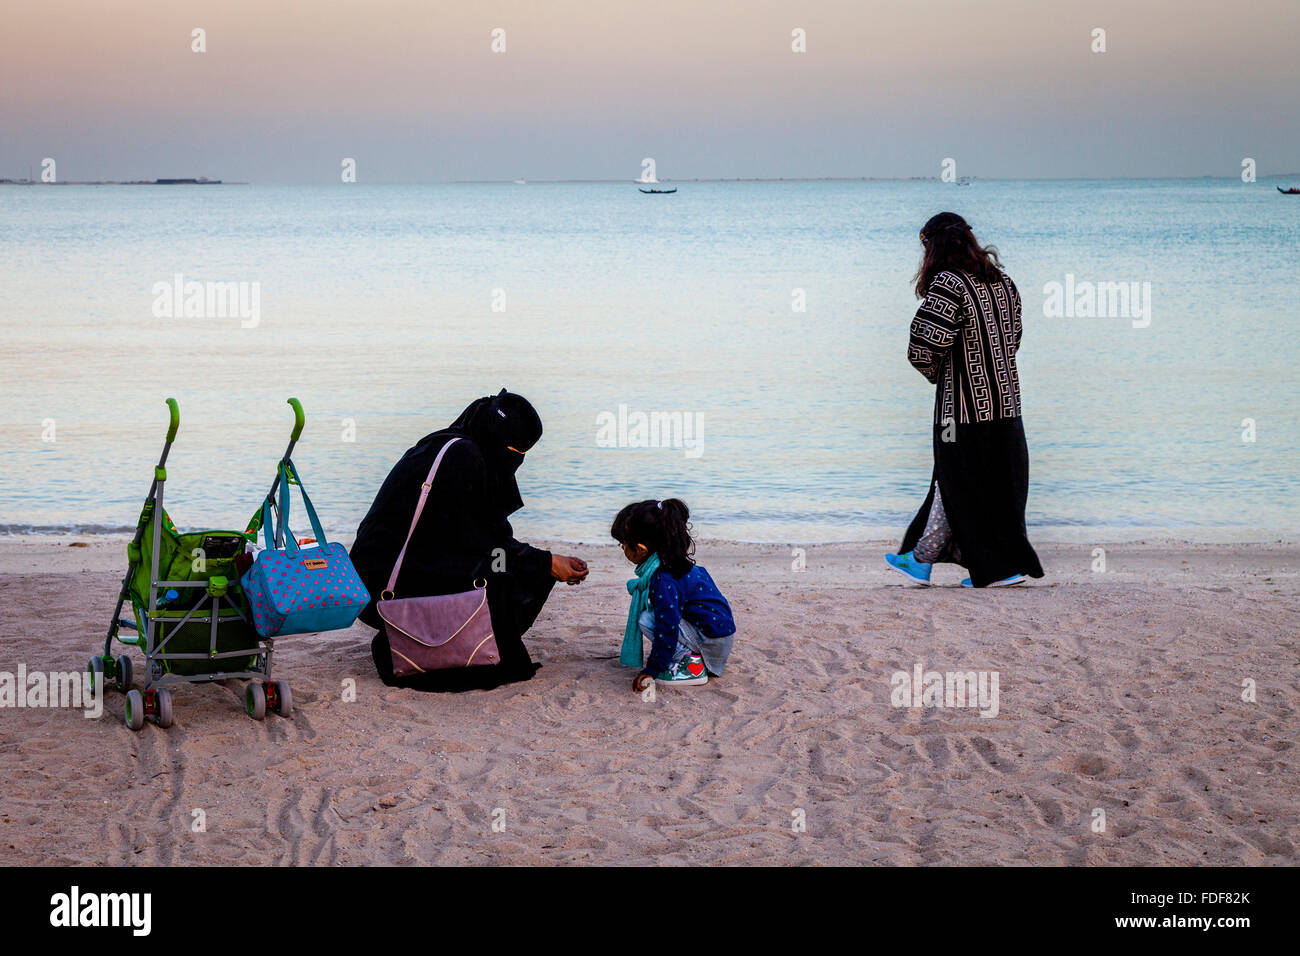 Local People On The Beach At The Katara Cultural Village, Doha, Qatar - Stock Image